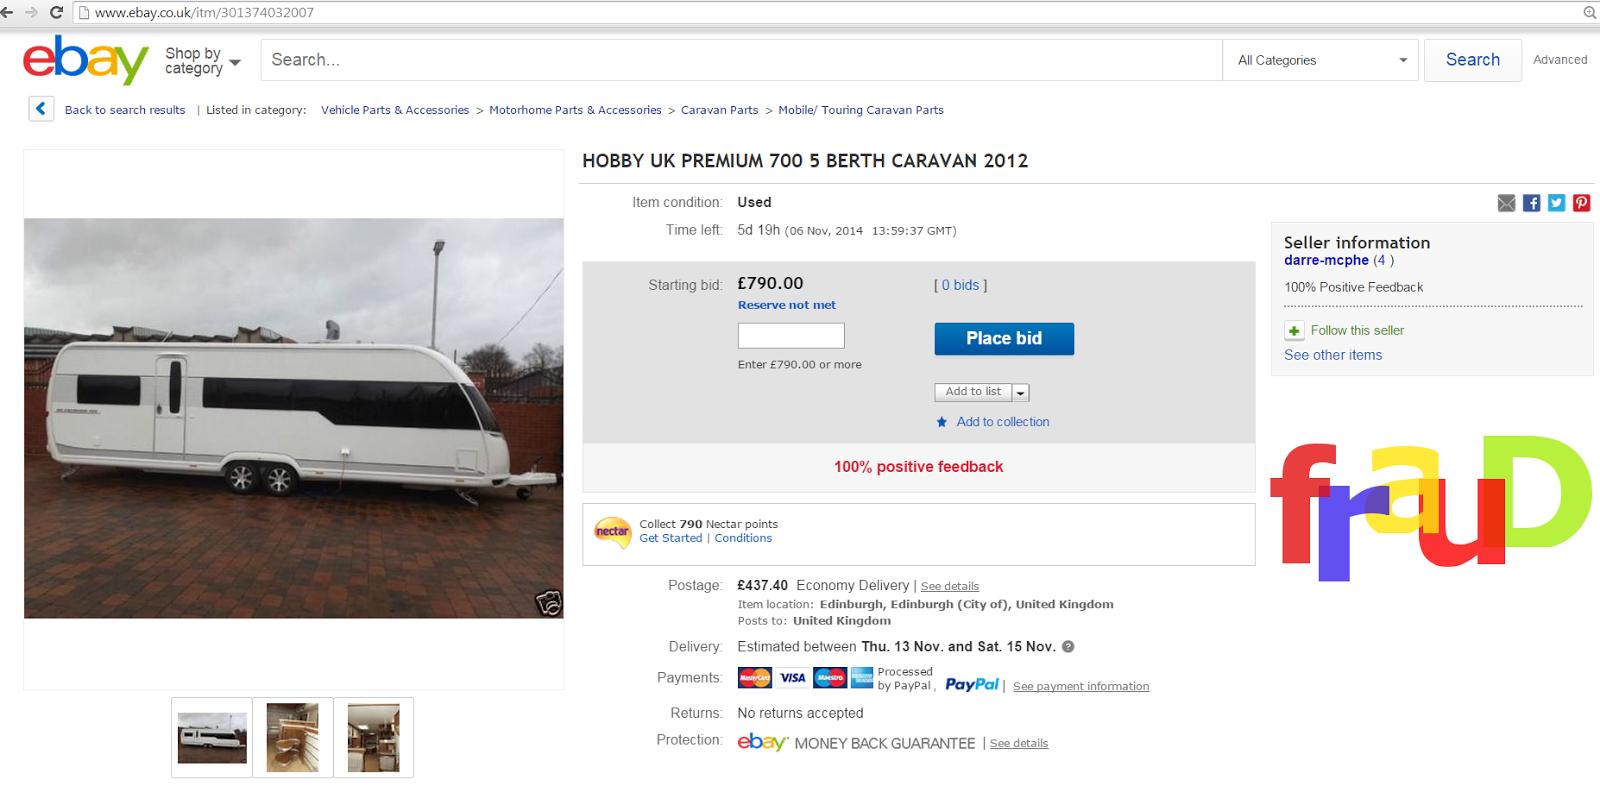 Ebay scams busted on halloween : Caravans motorhomes and campervans ...